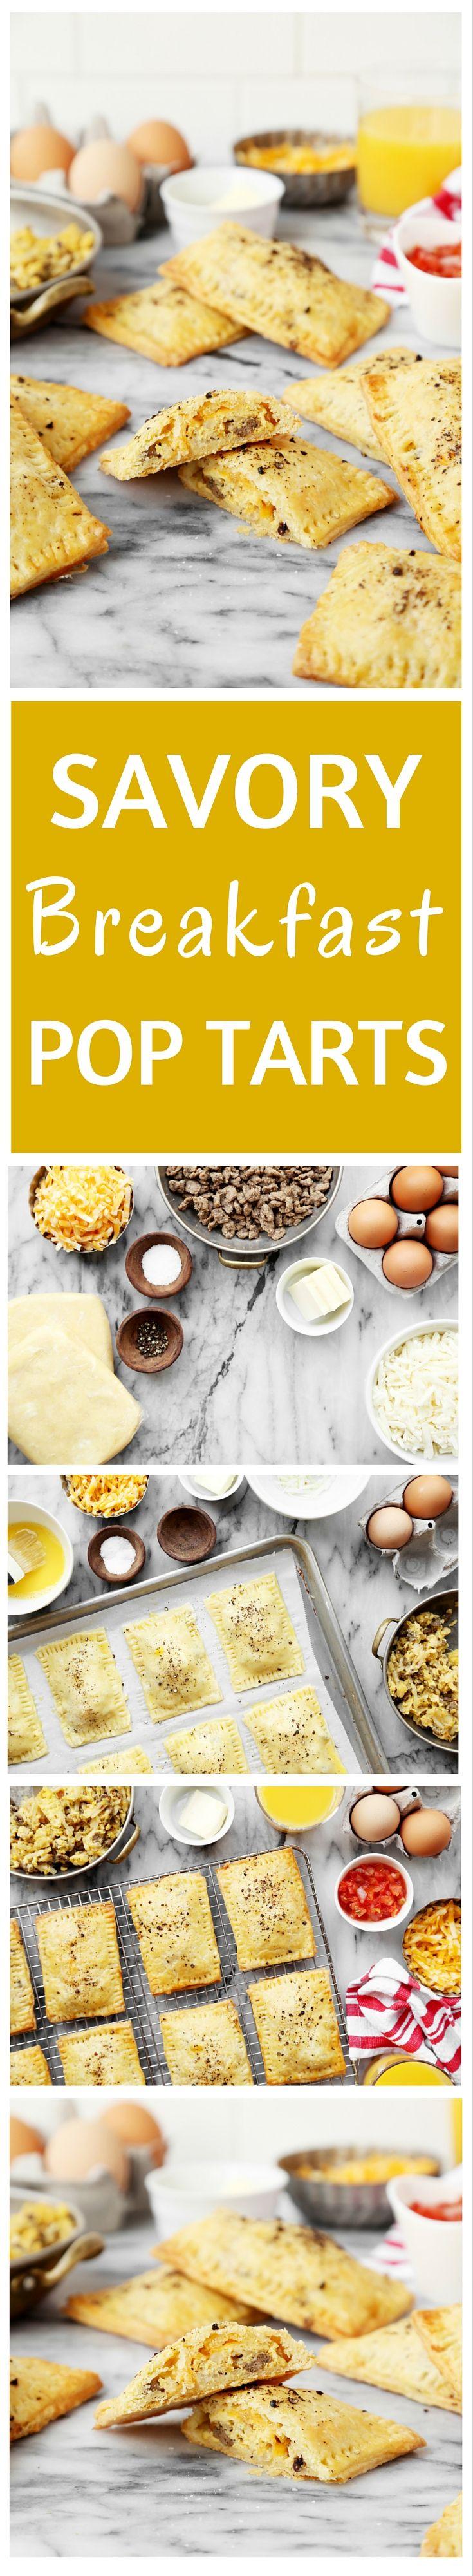 Savory Breakfast Pop Tarts